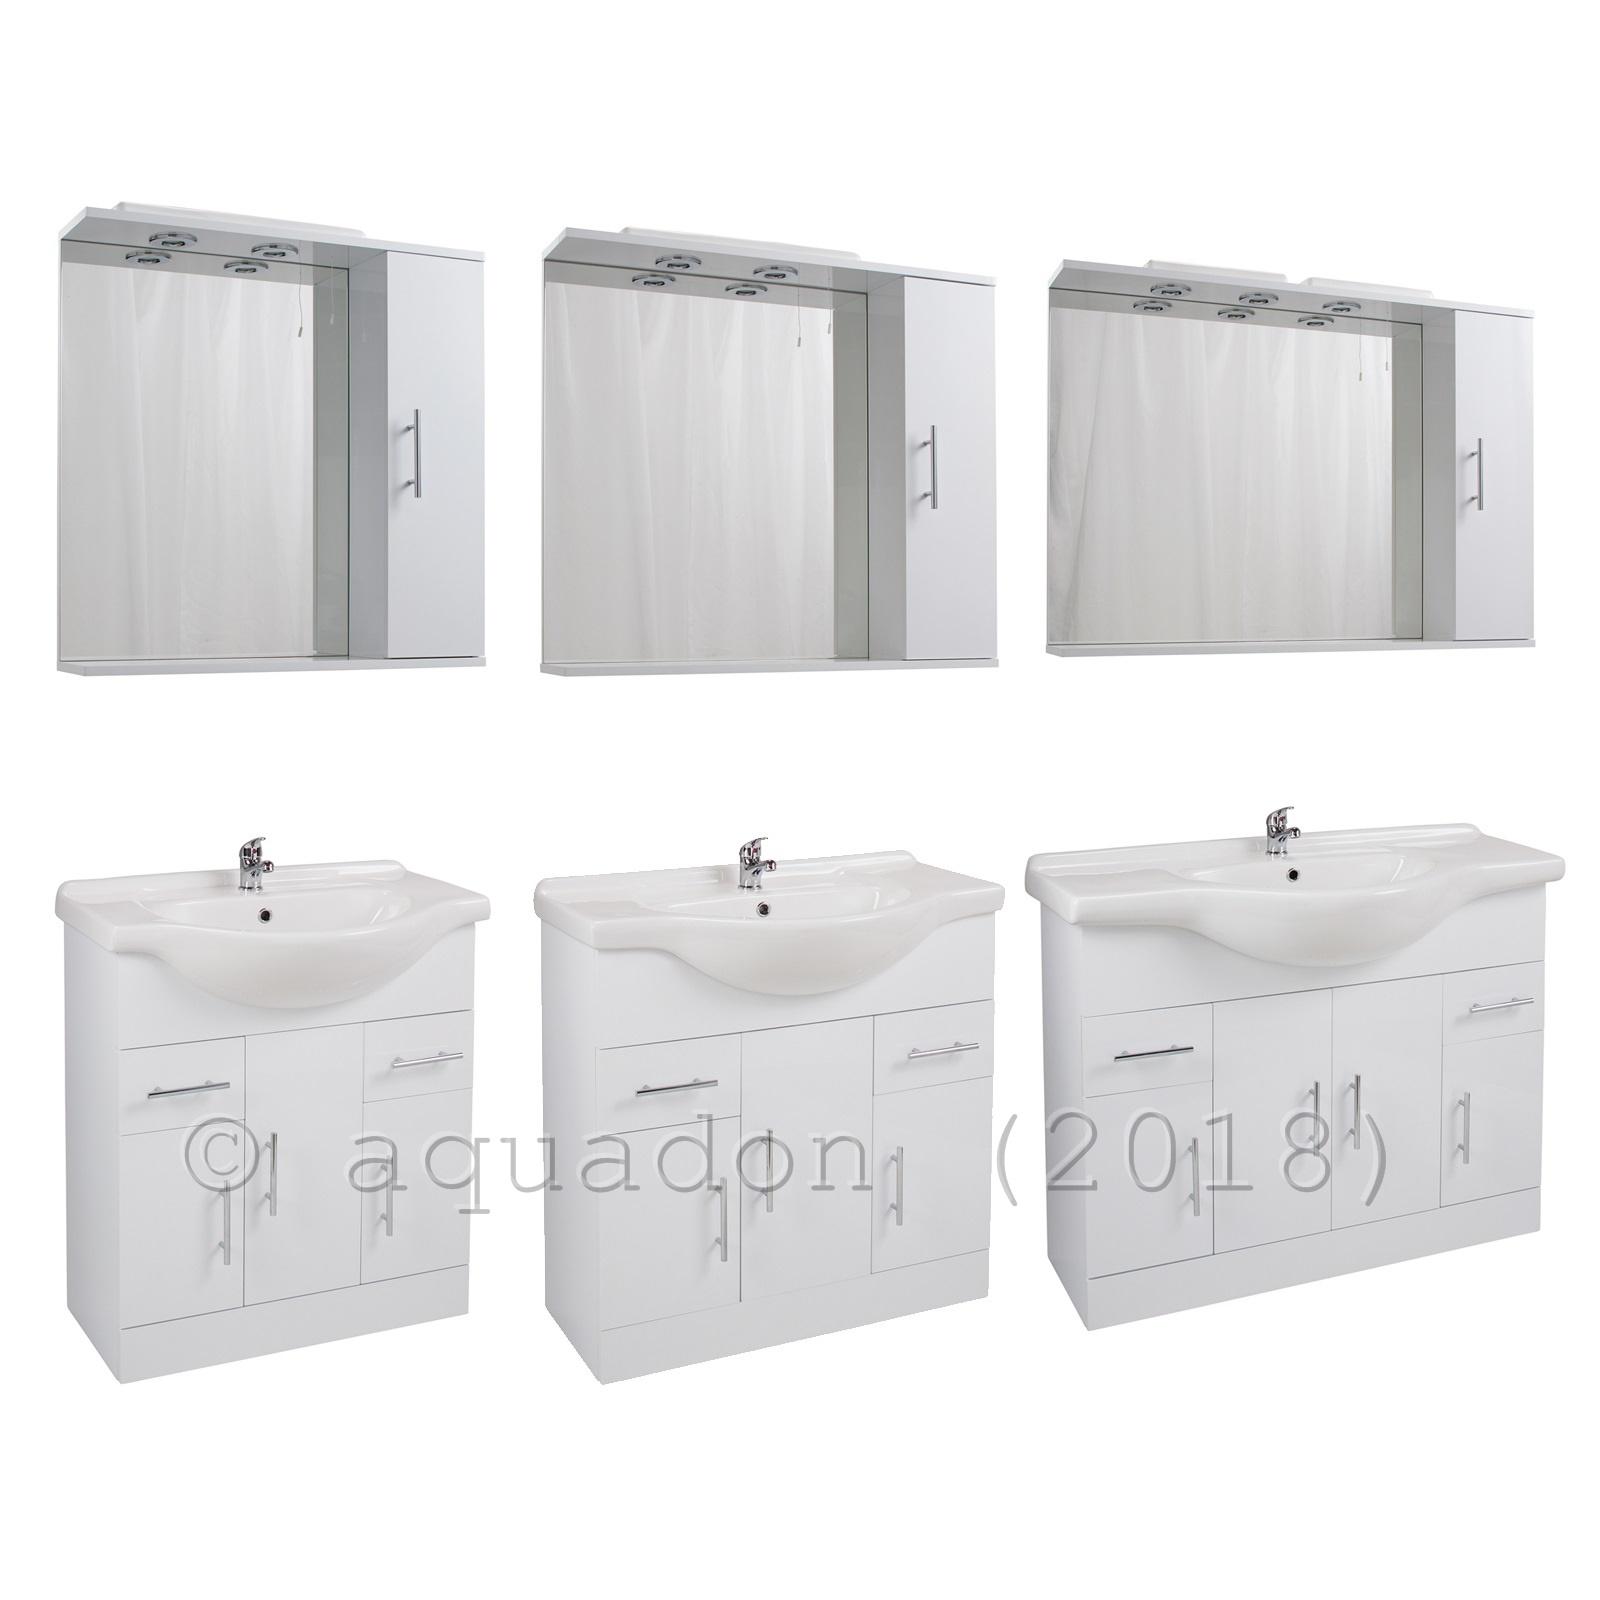 Bathroom vanity unit furniture gloss white illuminated - White gloss bathroom vanity unit ...